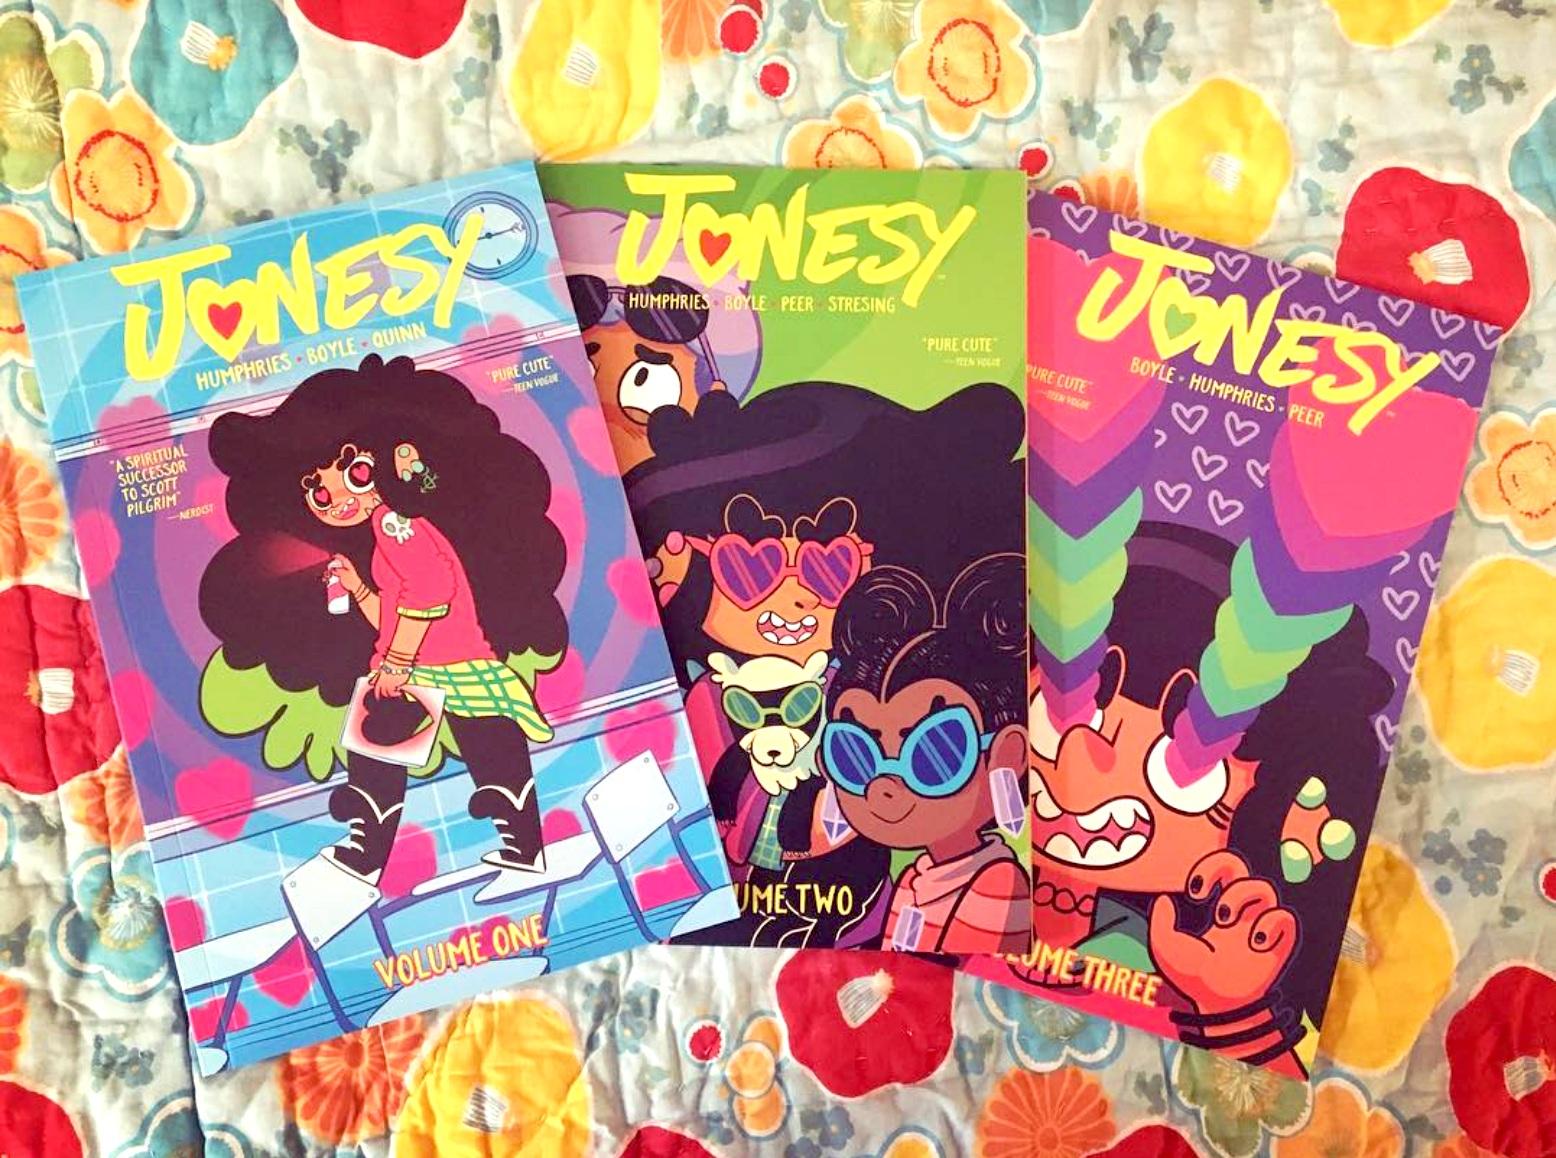 Jonesy_Volumes